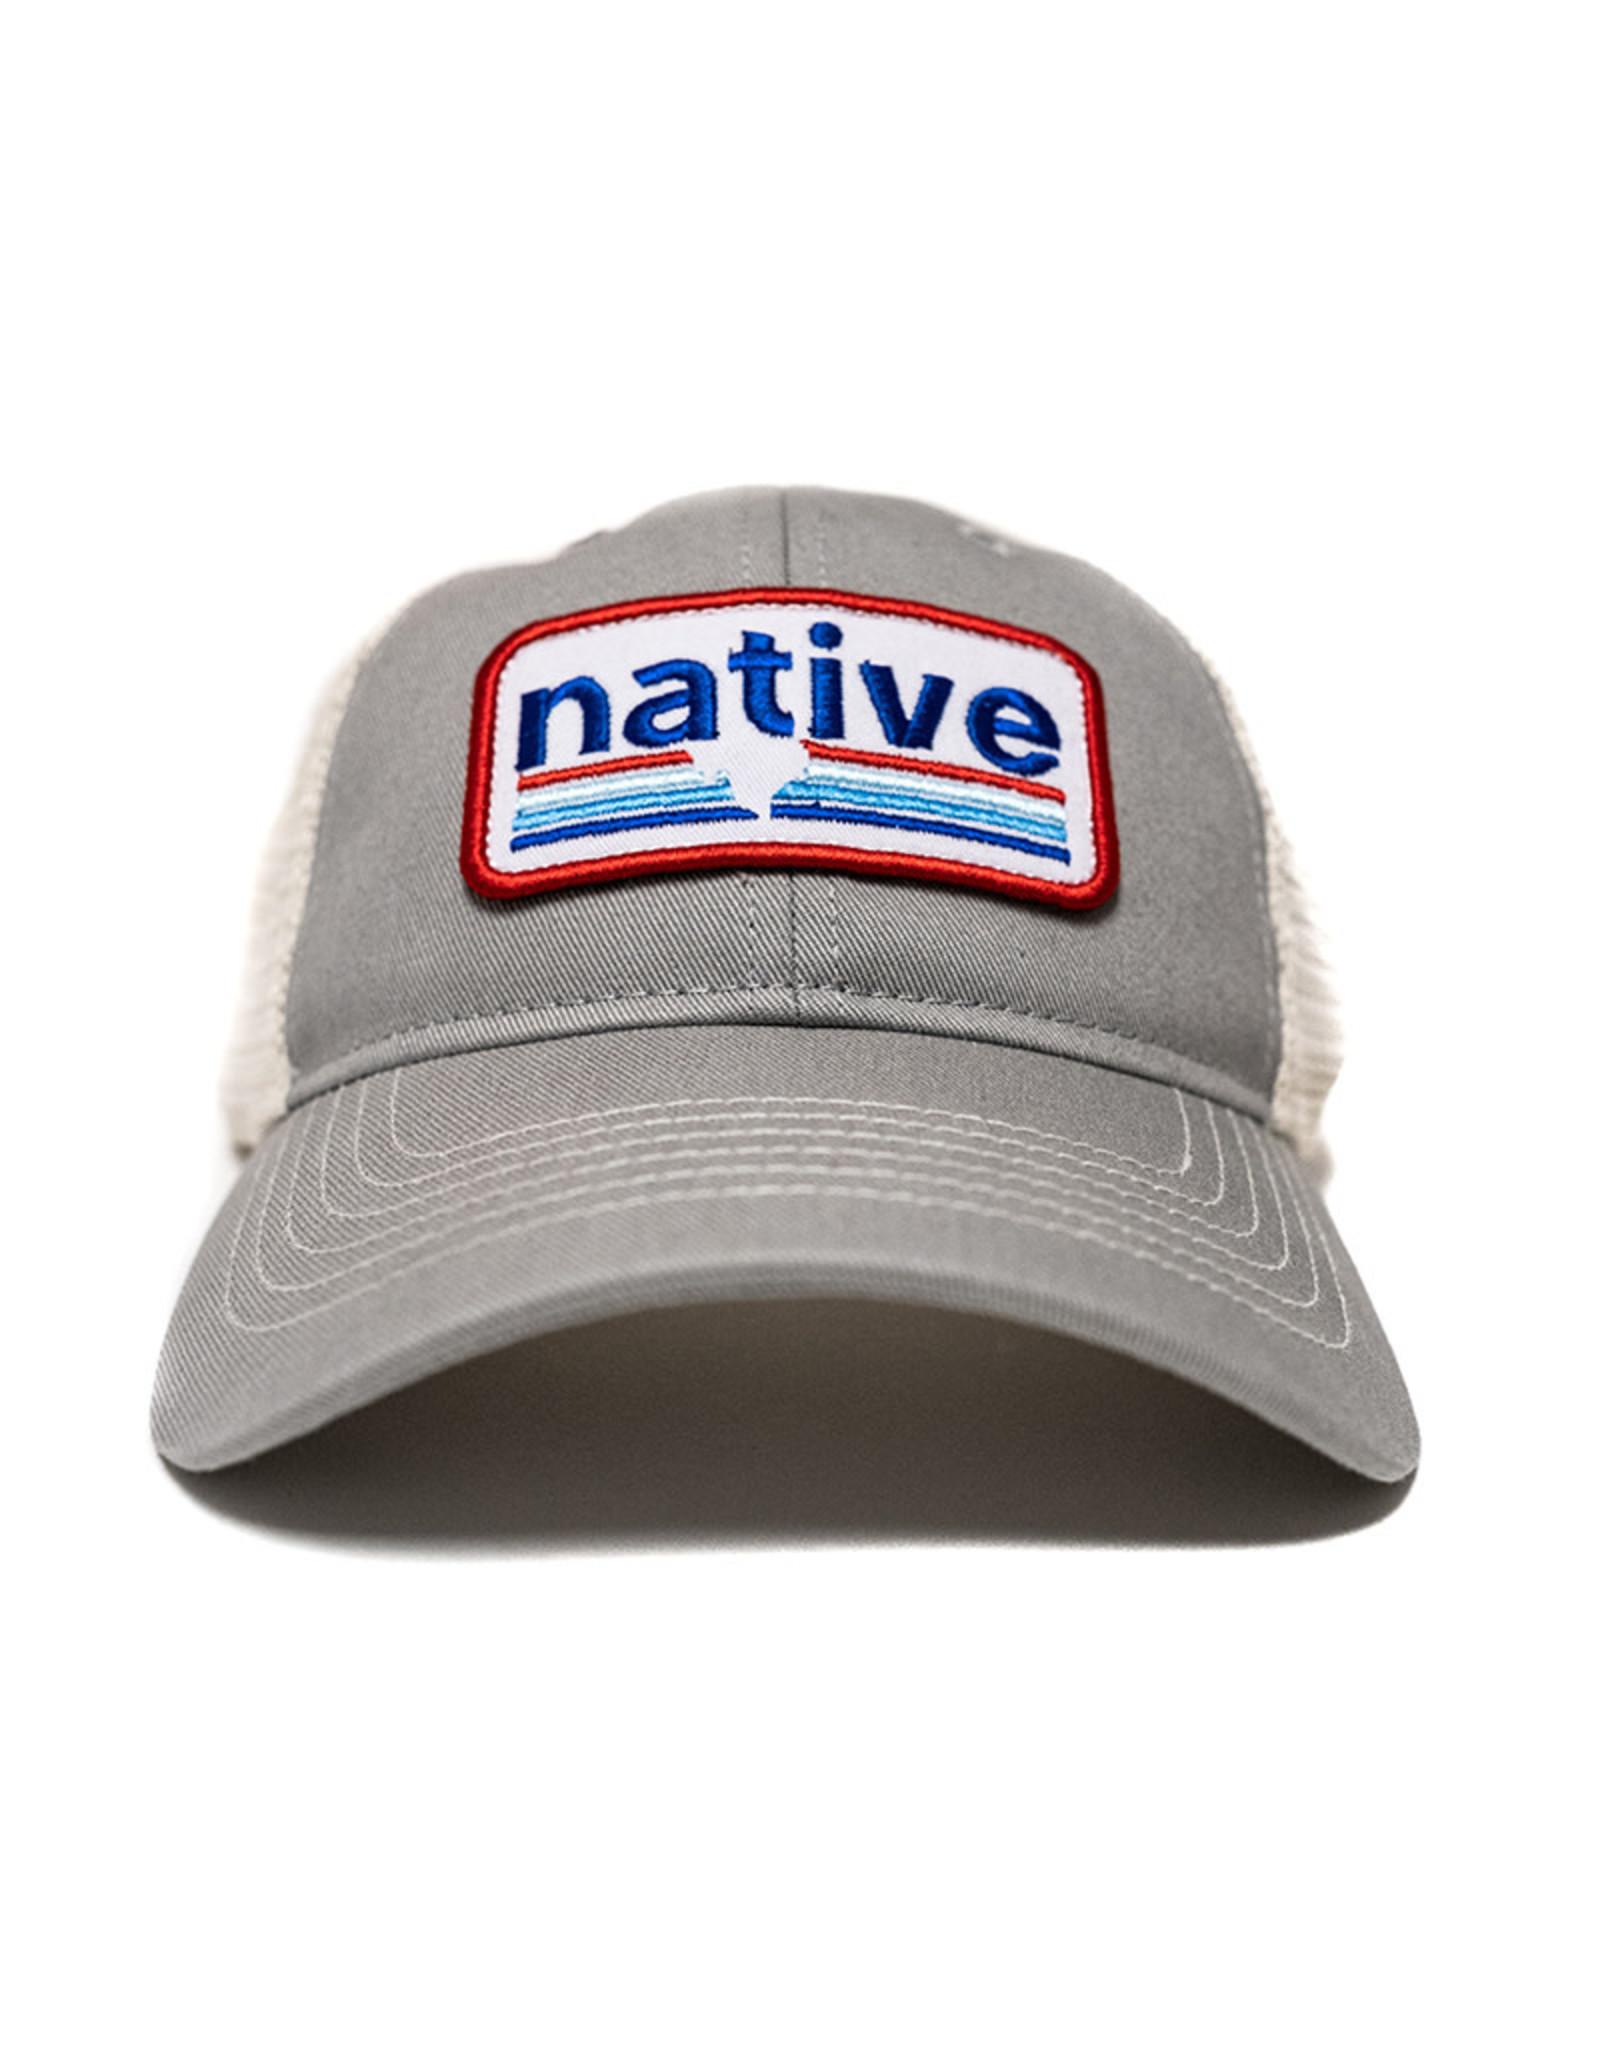 Wink Native Texan Trucker Hat